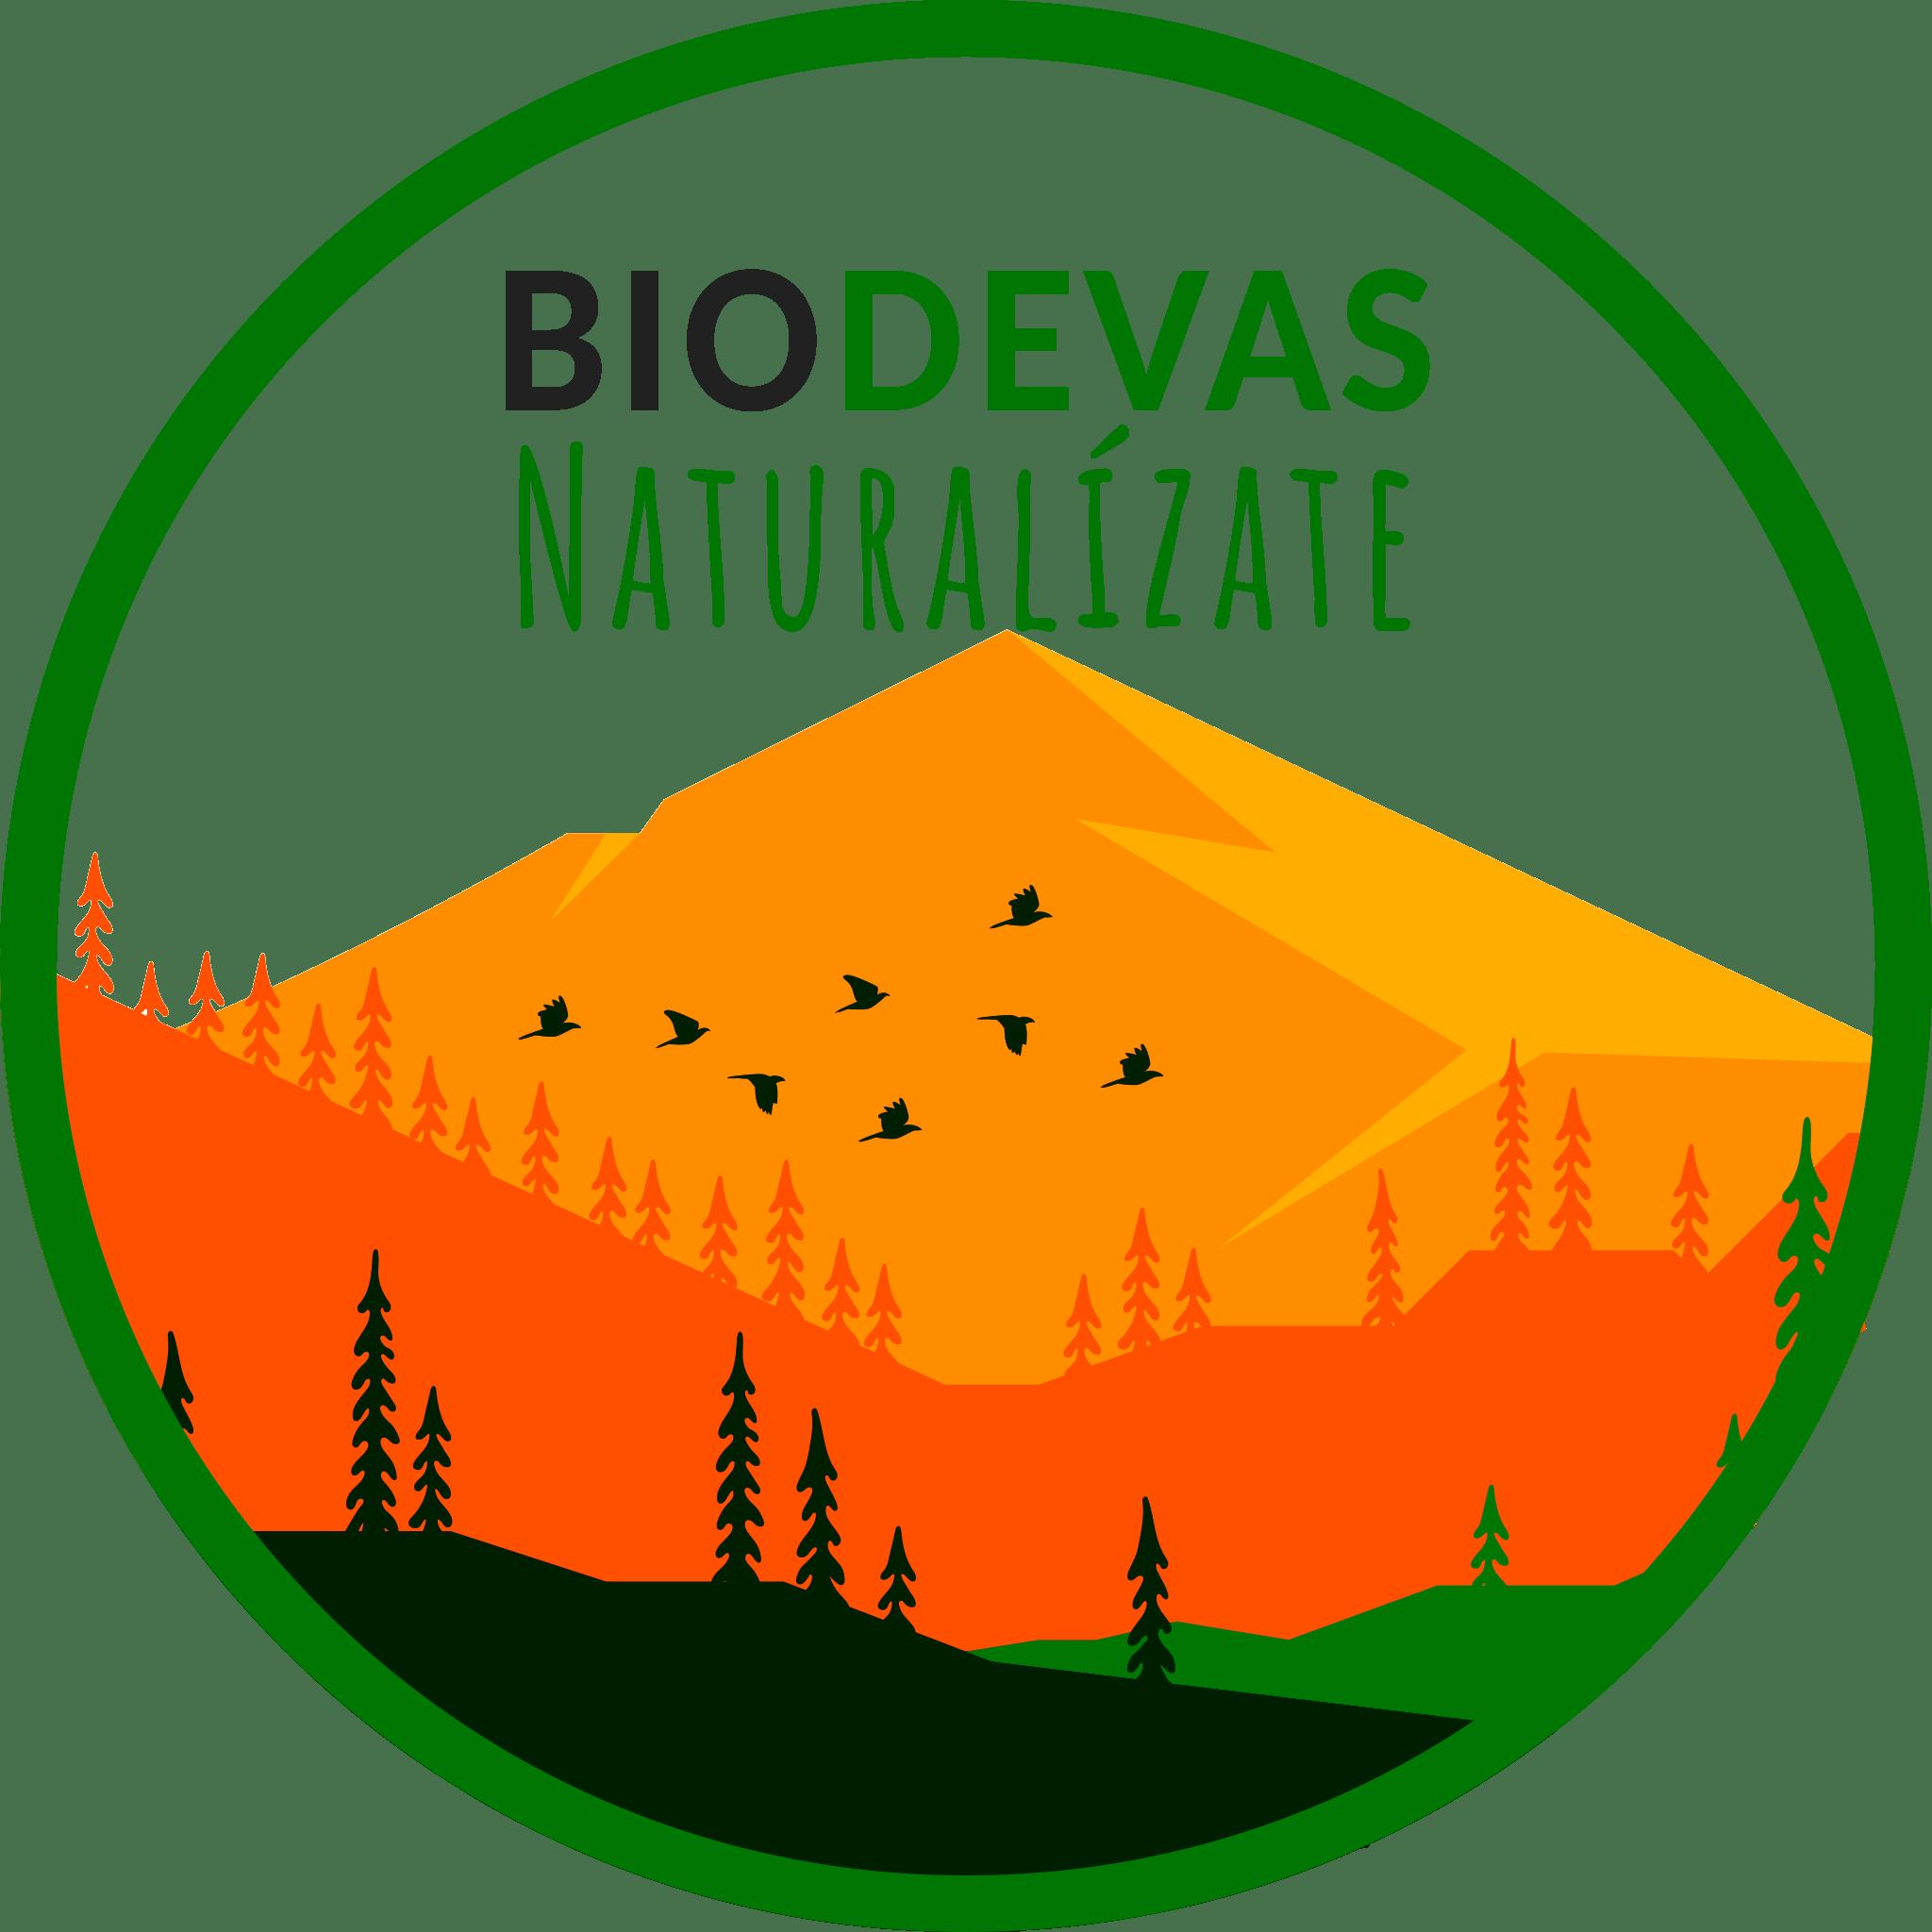 LogoBiodevas2021 circulo verde naturalizate